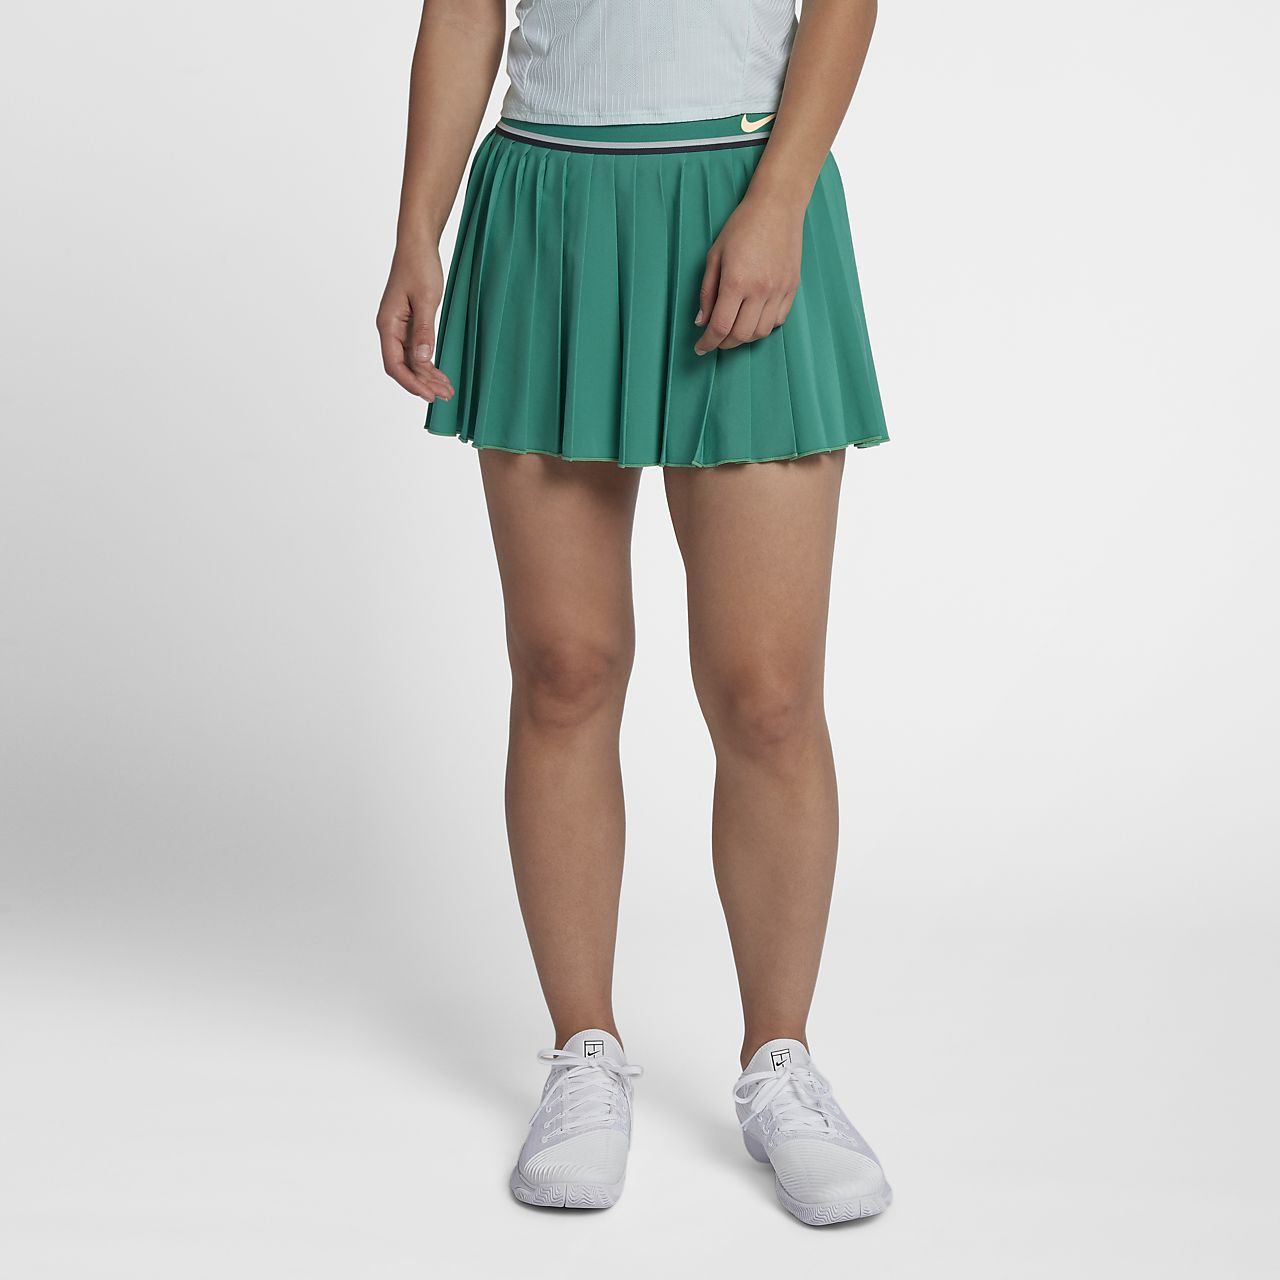 NikeCourt Femme pour Jupe Victory de tennis 0HwqTAx4O